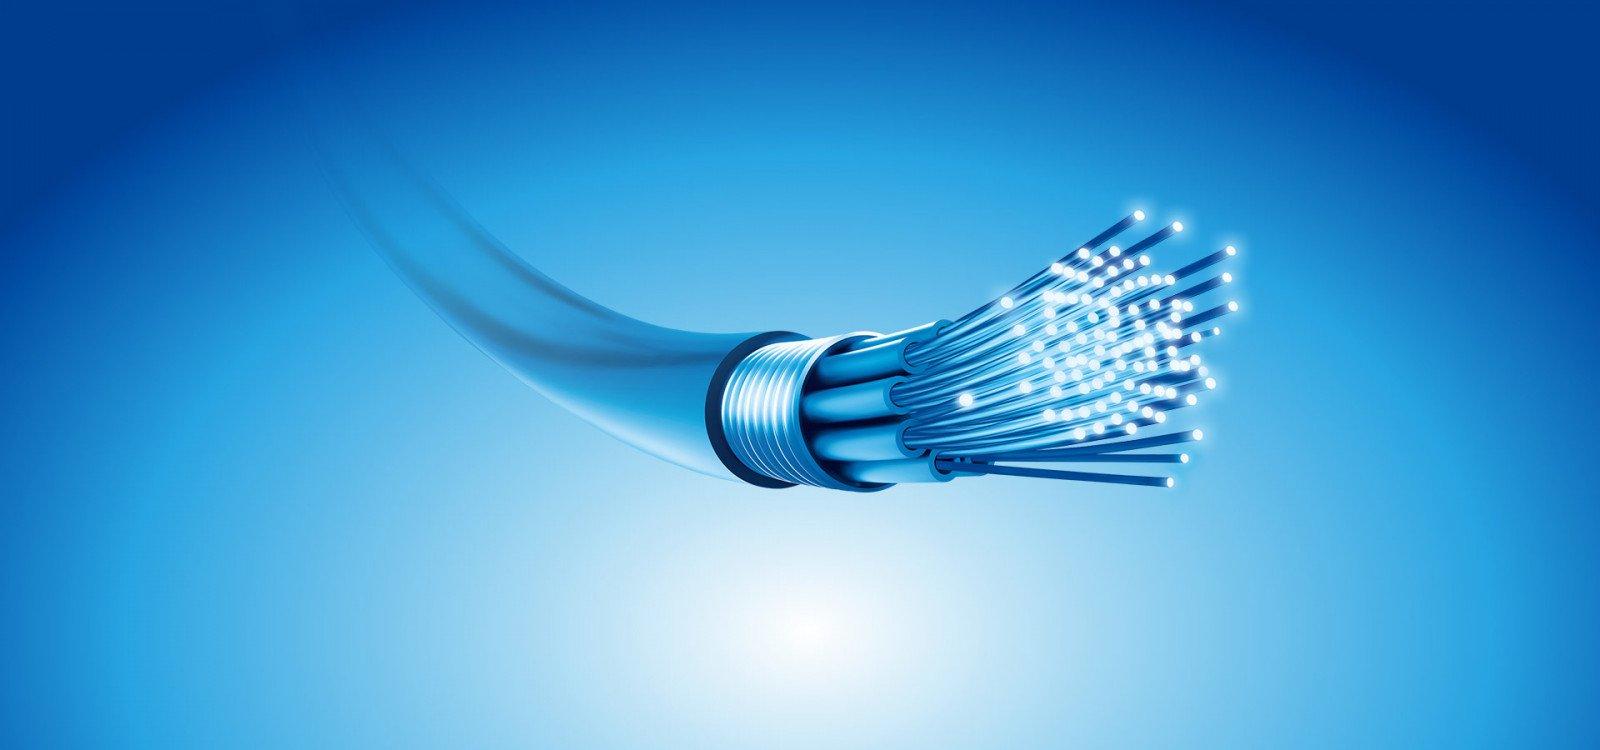 Breitband-Internetverbindung